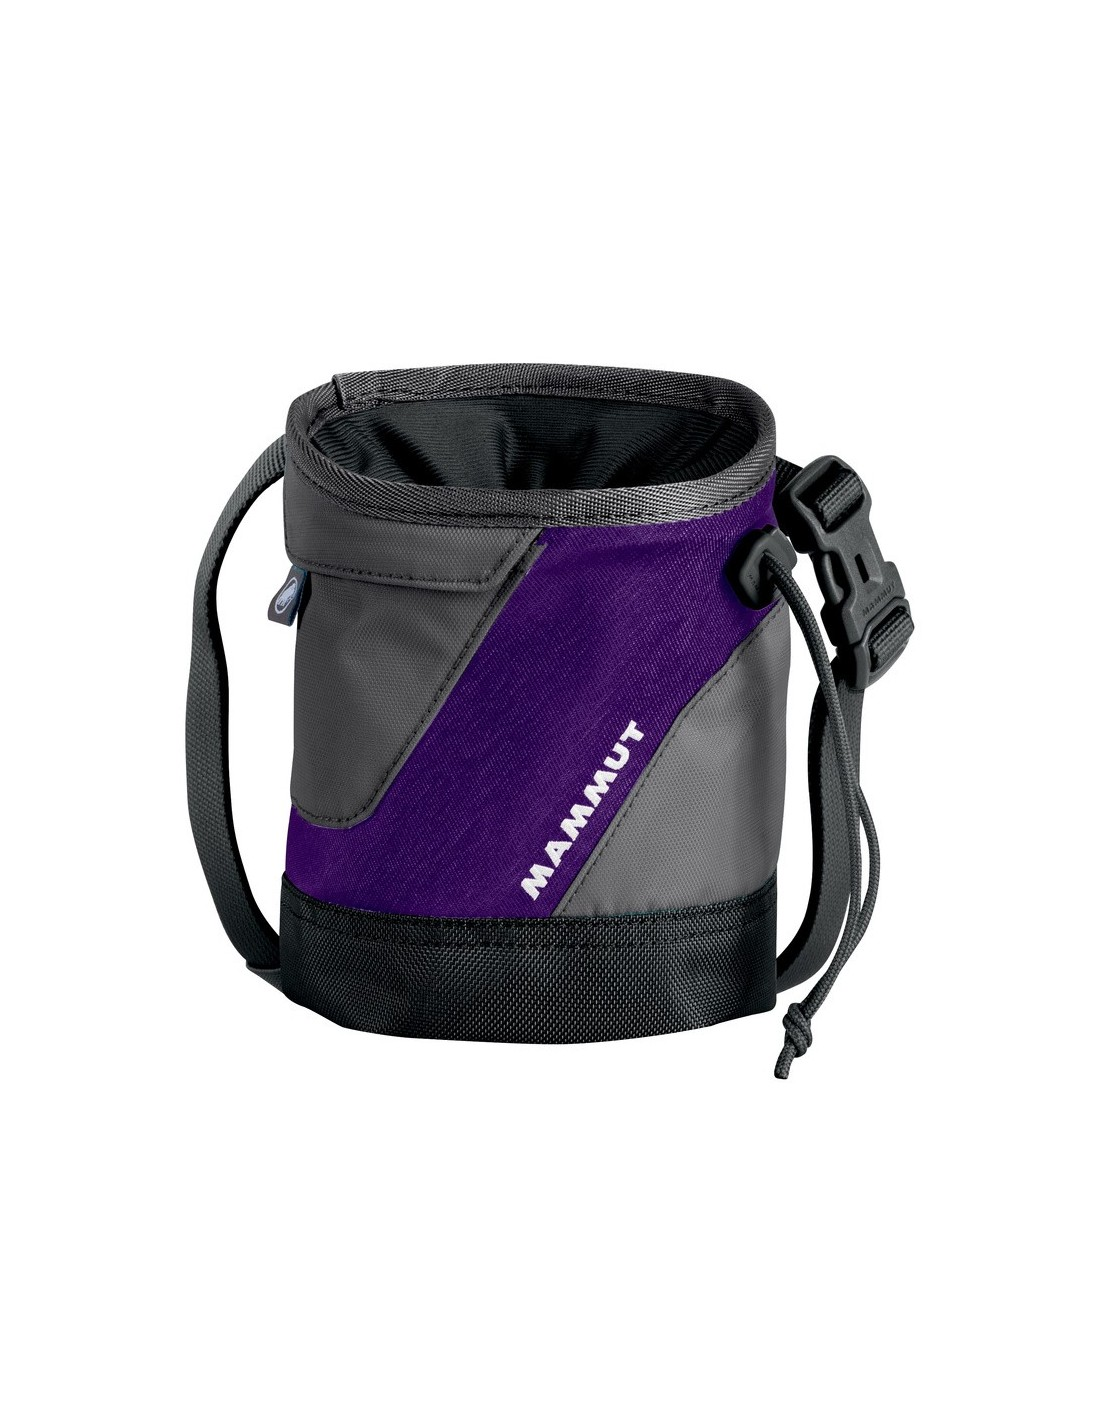 Mammut Ophir Chalk Bag persian-smoke Chalkbag Farbe - Violett, Chalkbag Verwendu